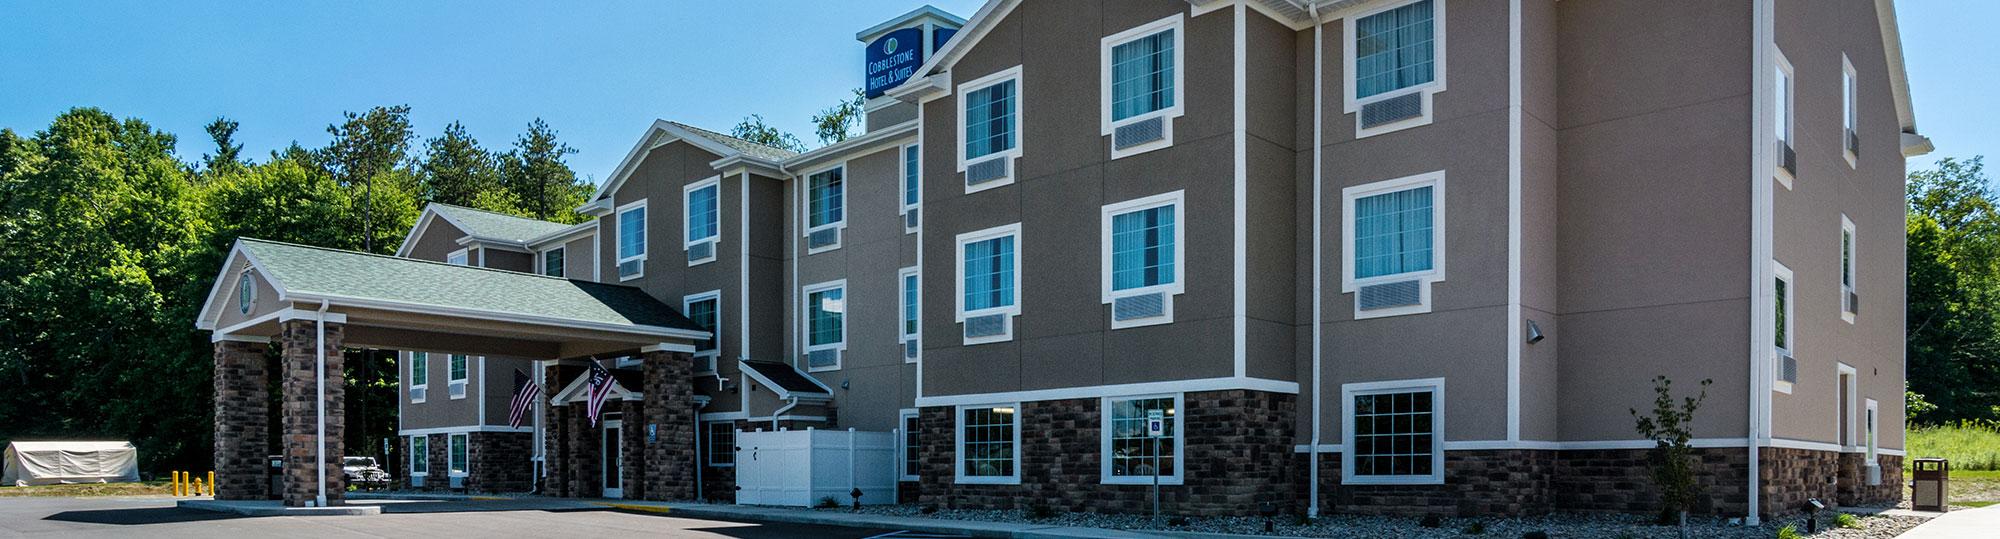 Cobblestone Inn and Suites Kermit